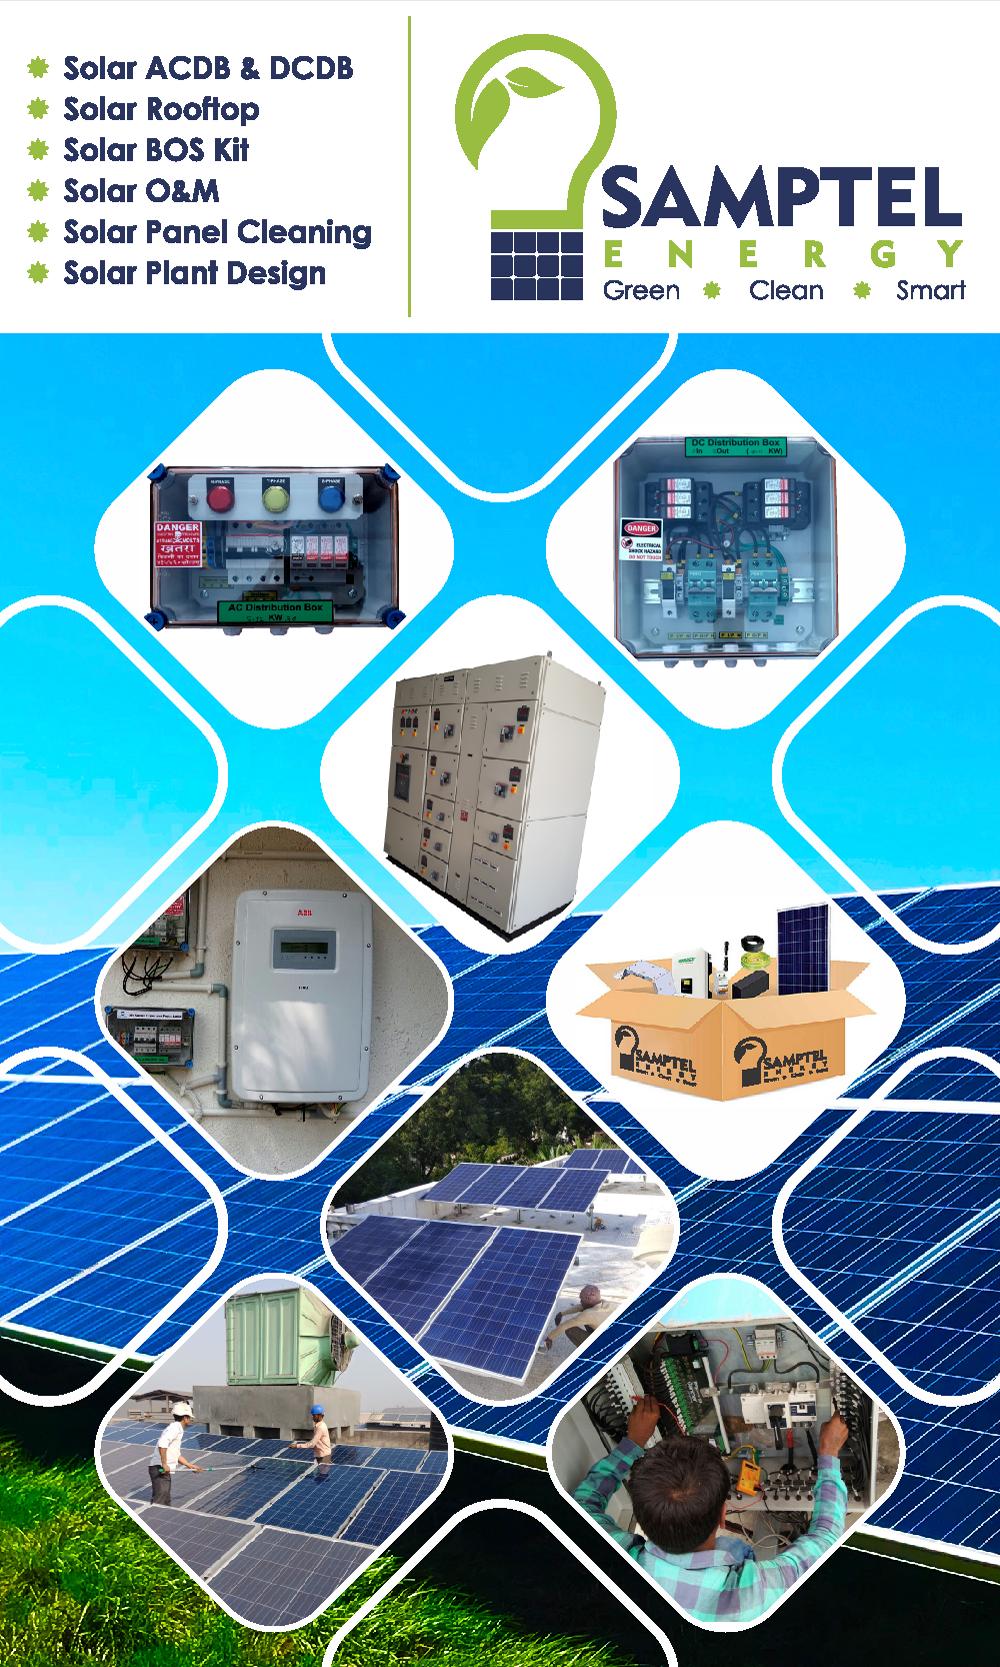 Solar BOS (Balance of System) Kit